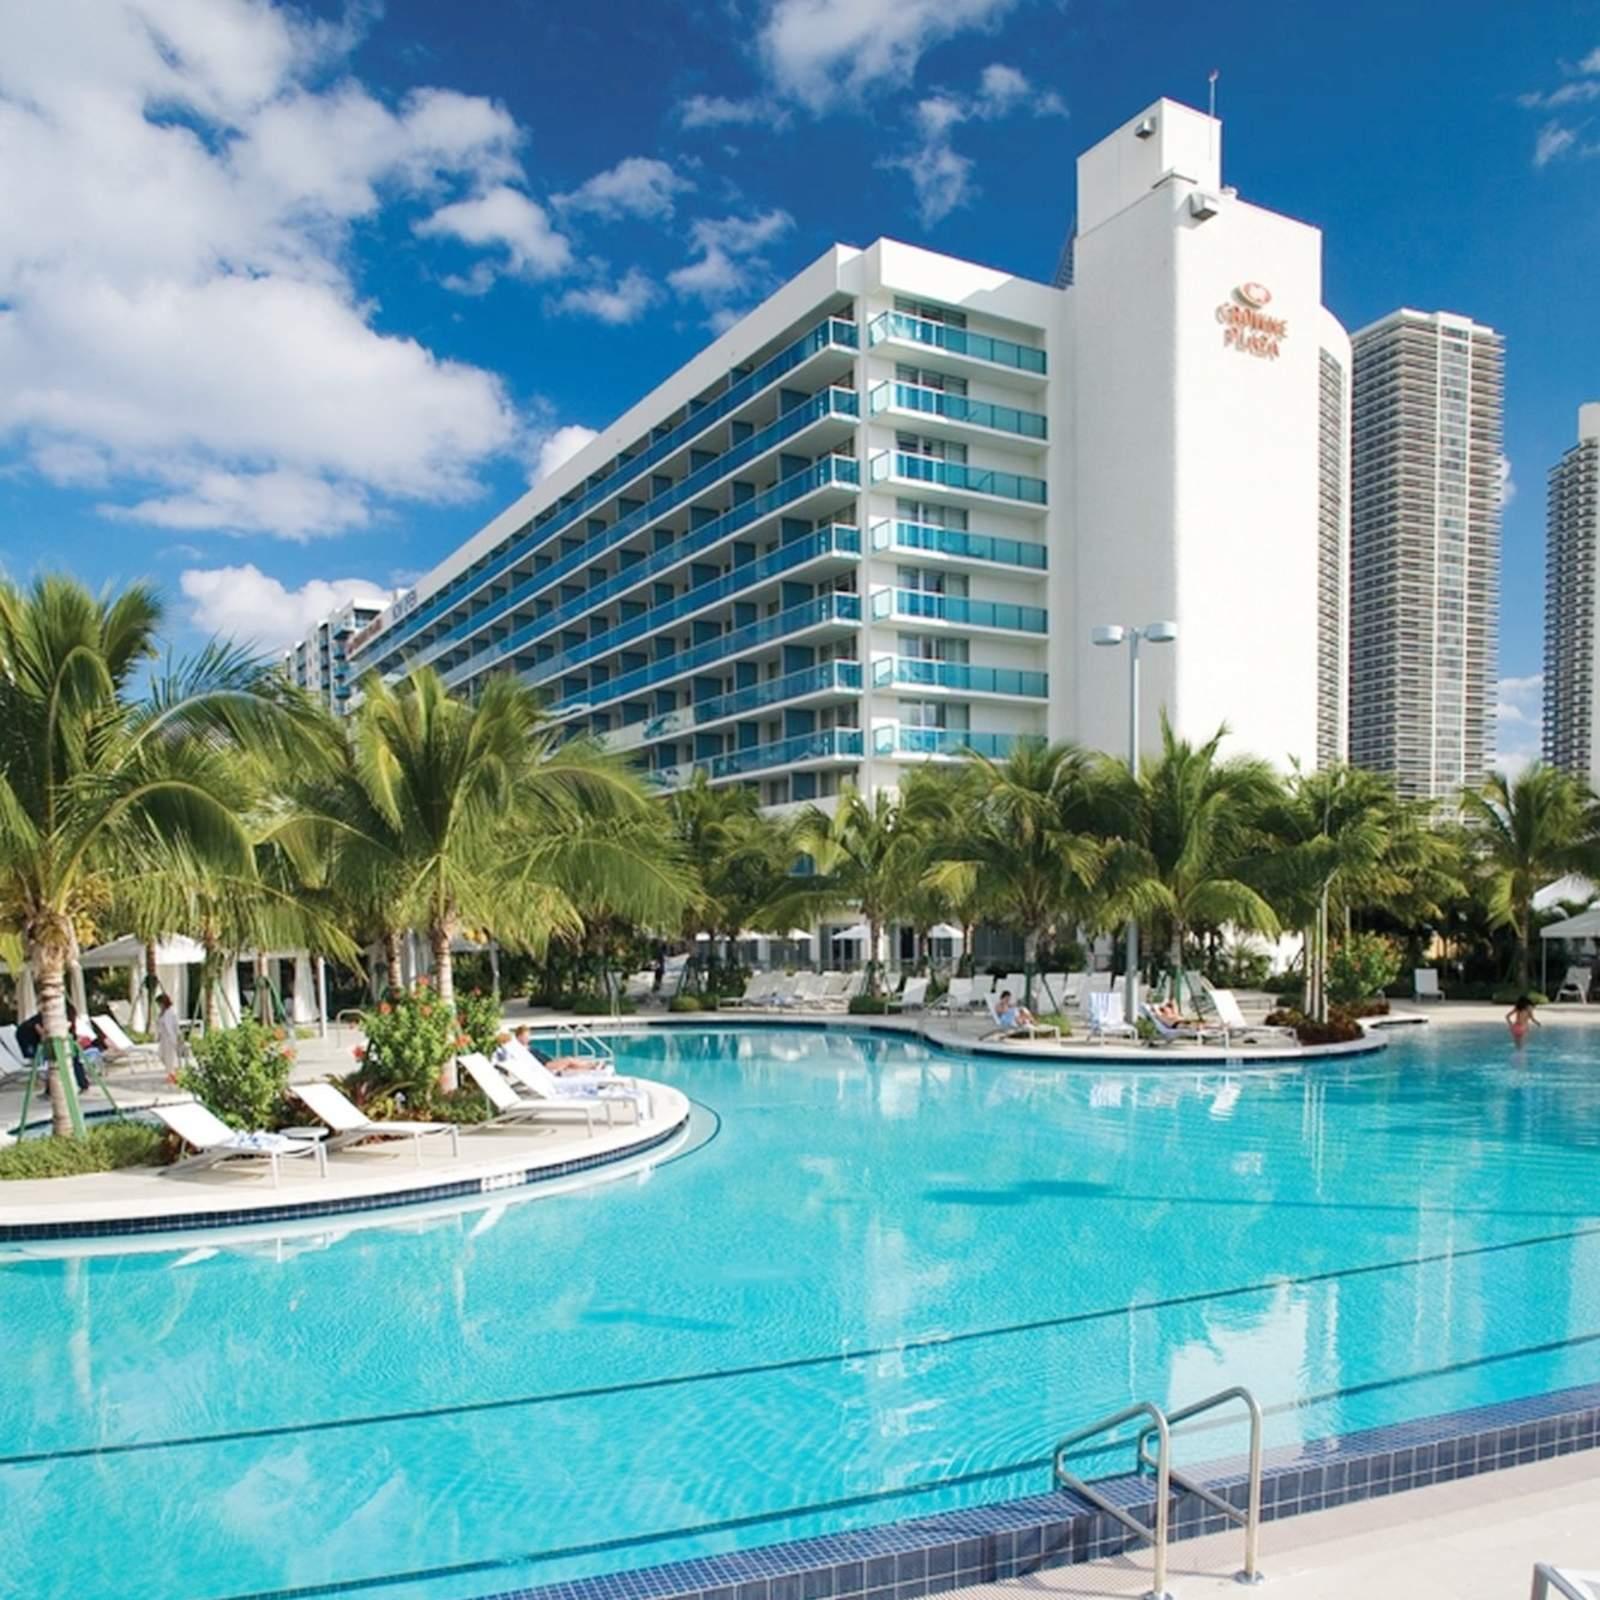 Crowne Plaza Hotel Hollywood Beach Resort